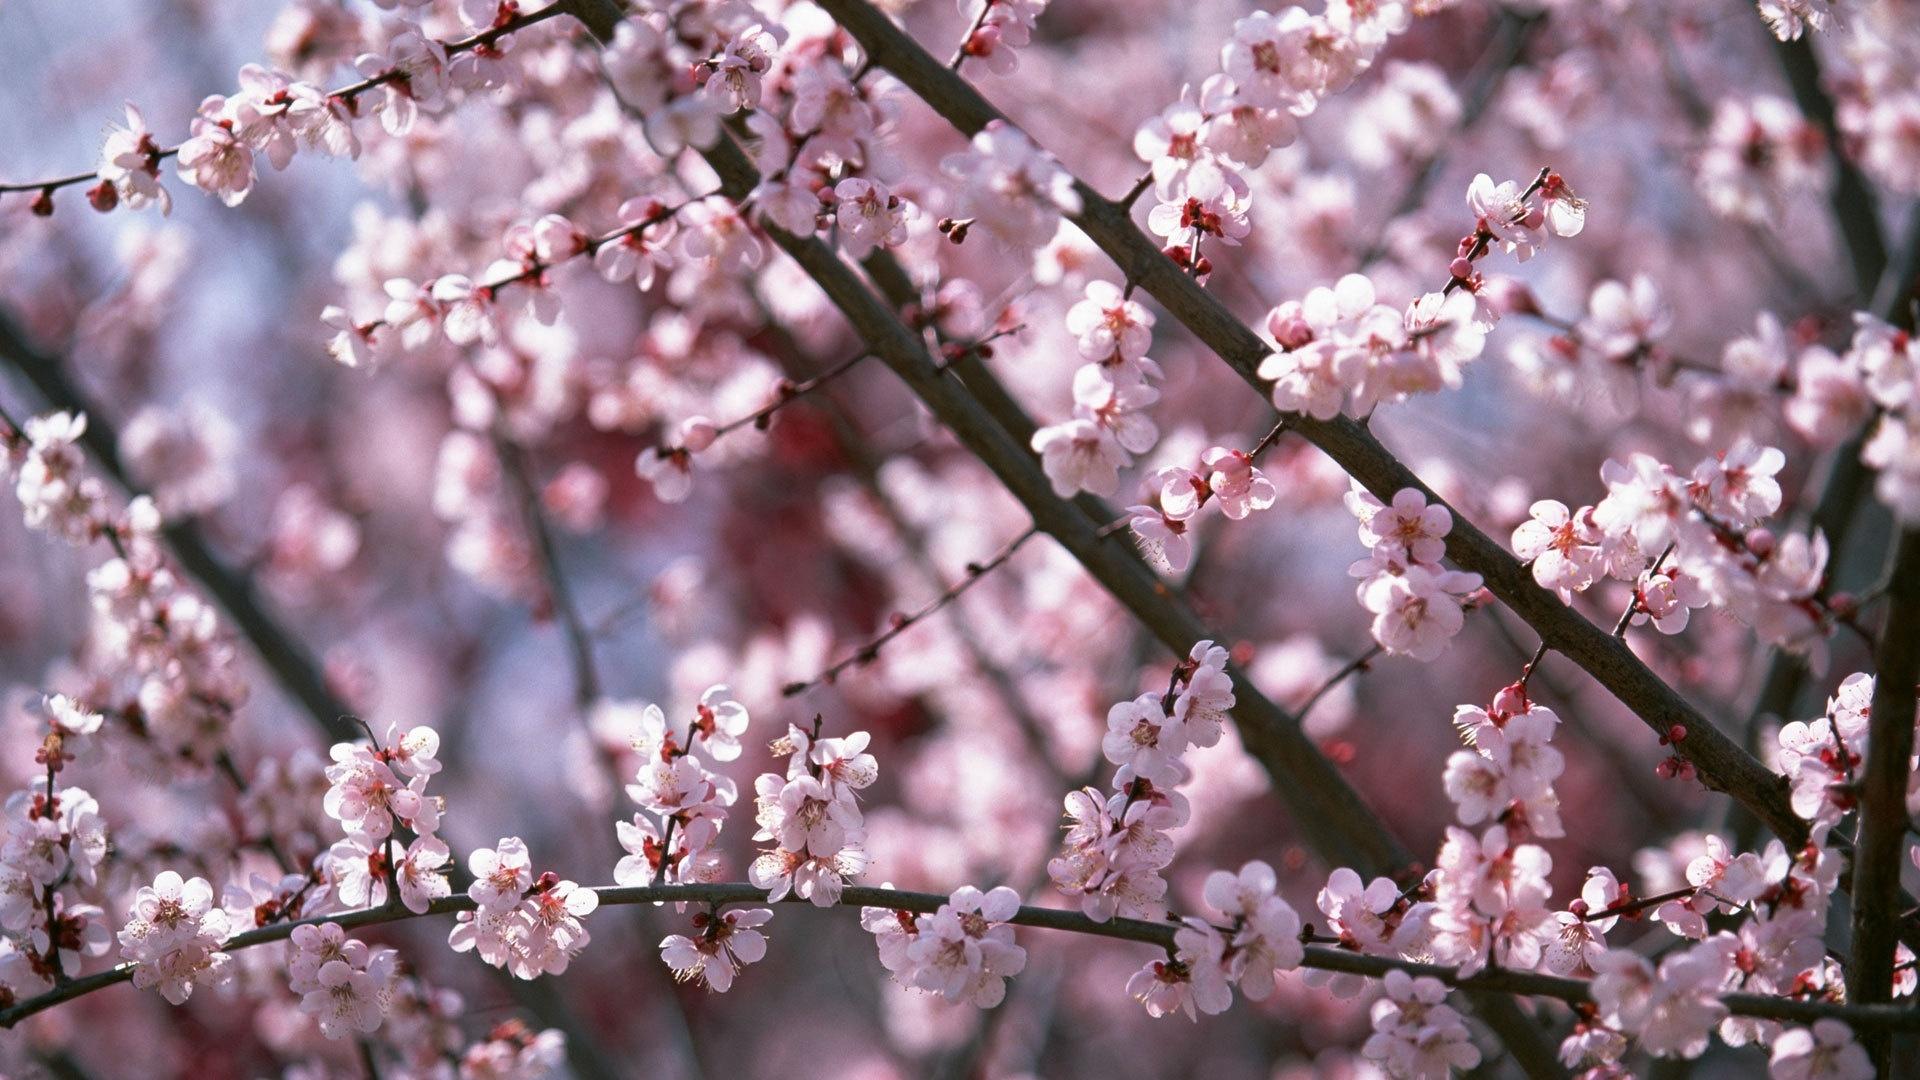 Sakura Blossom wallpaper photo hd